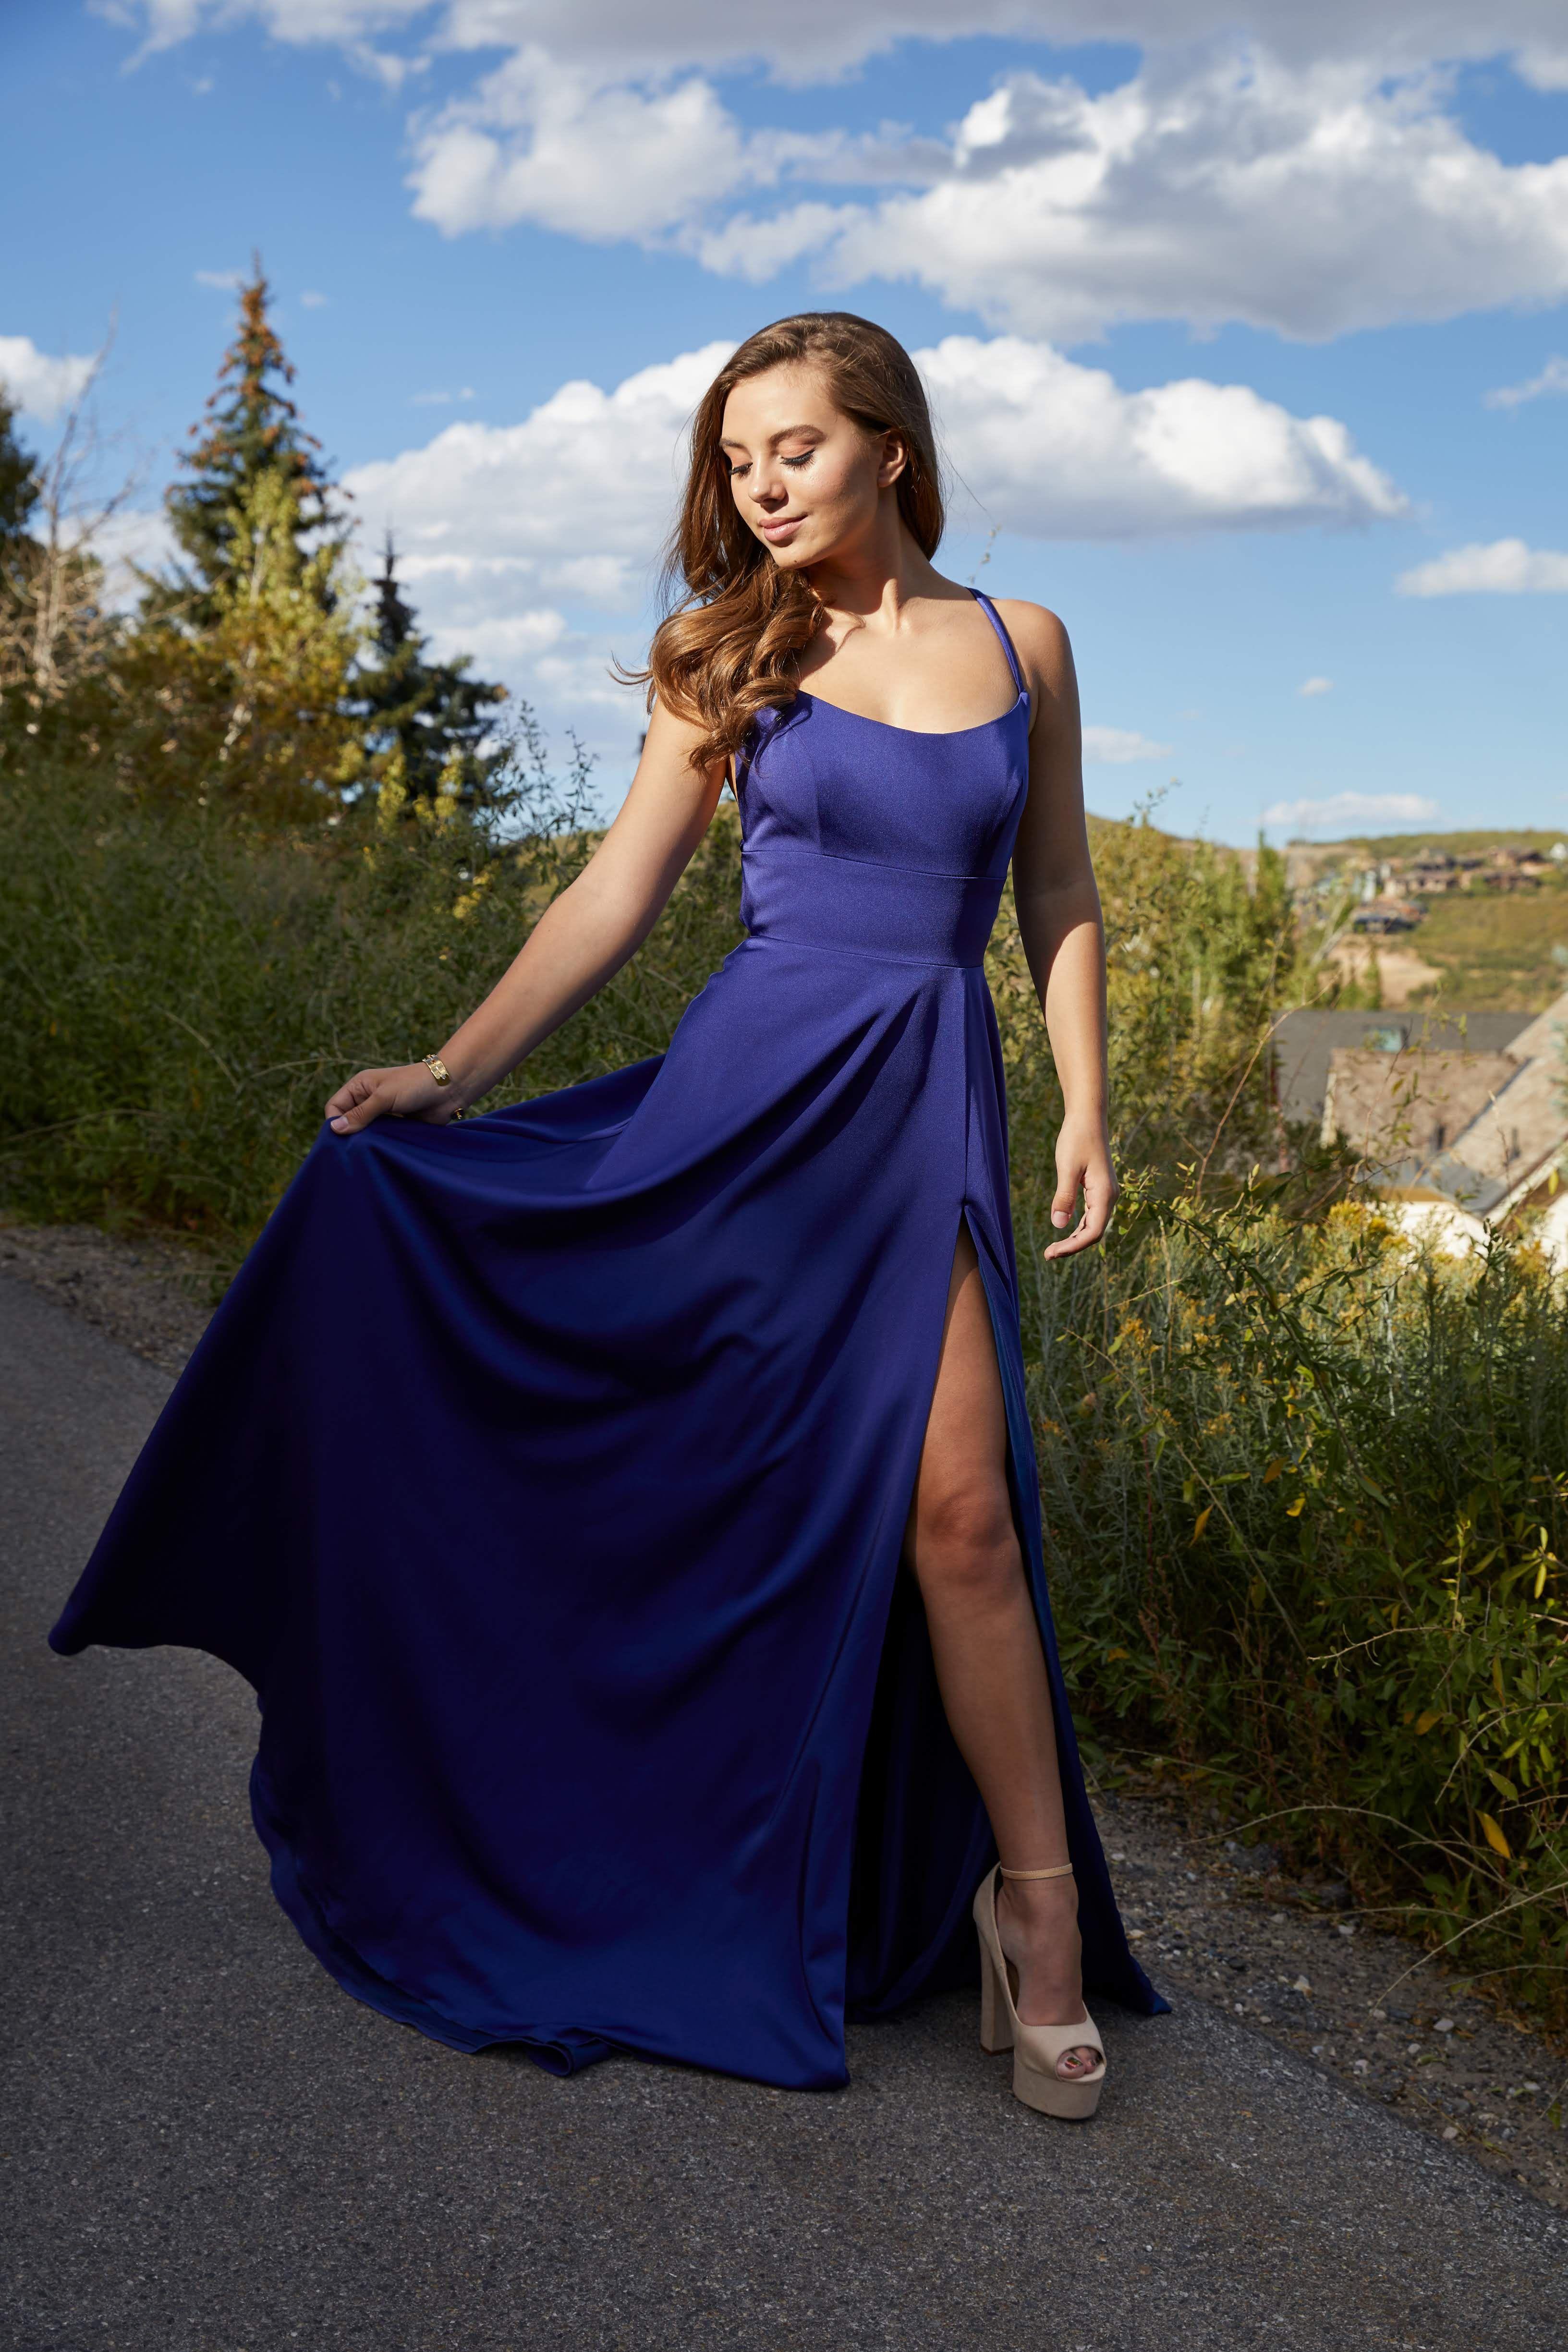 Long Straight Neck Sleeveless Prom Dress By Flair Prom Dresses Sleeveless Dresses Designer Formal Dresses [ 4898 x 3265 Pixel ]